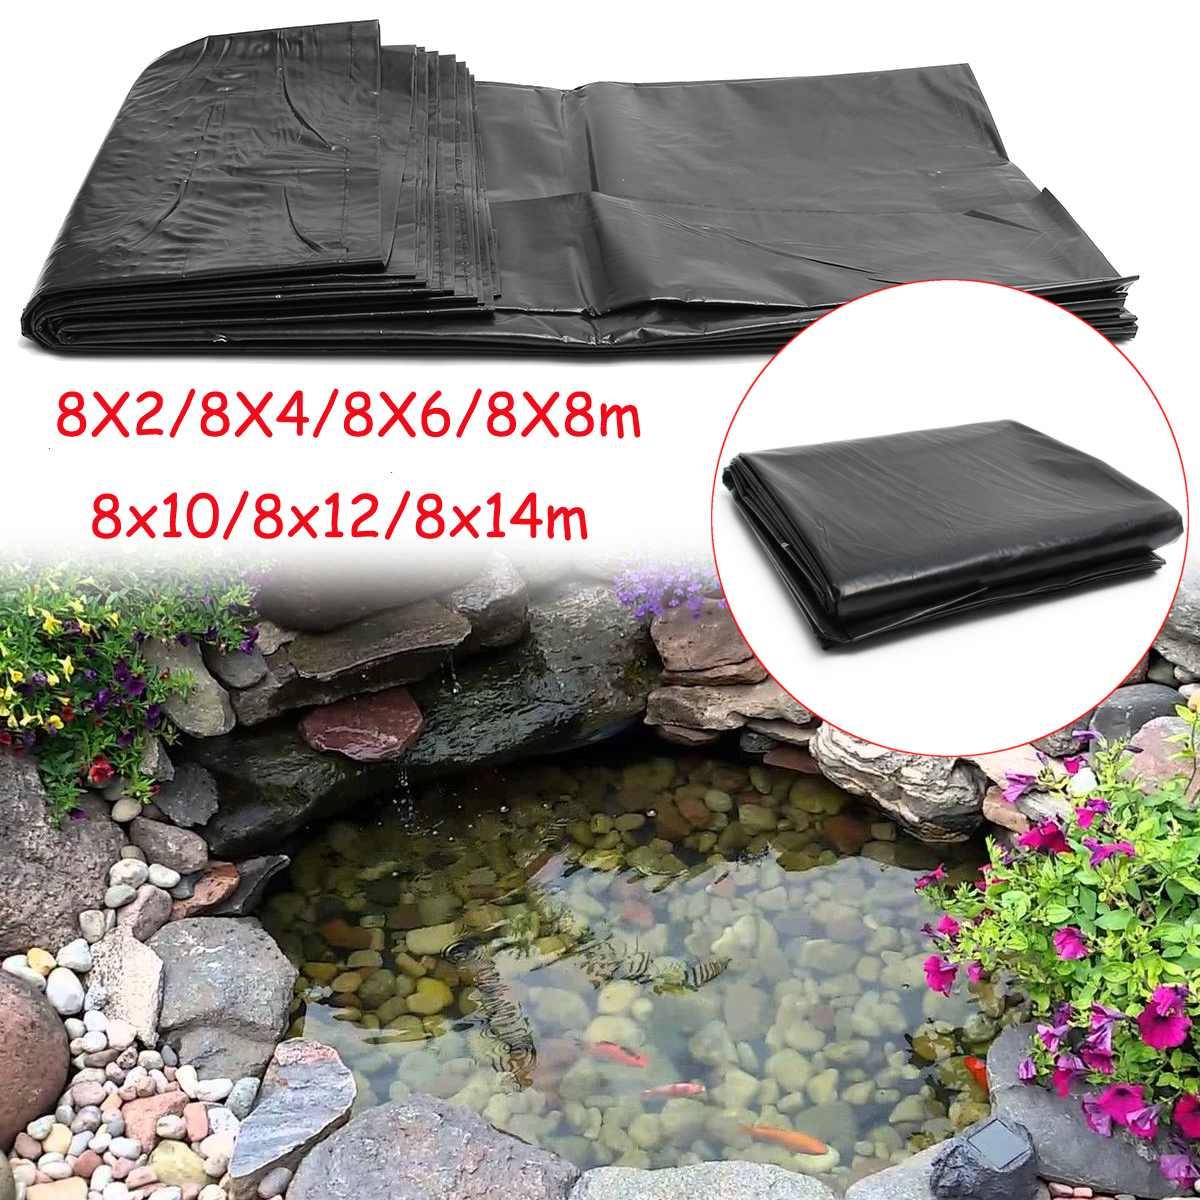 HDPE Fish Pond Liner Waterproof Membrane 8x14m / 8x12m / 8x10m / 8x8m / 8x6m/ 8x4m Garden Pond Landscaping Pool Thick Liner